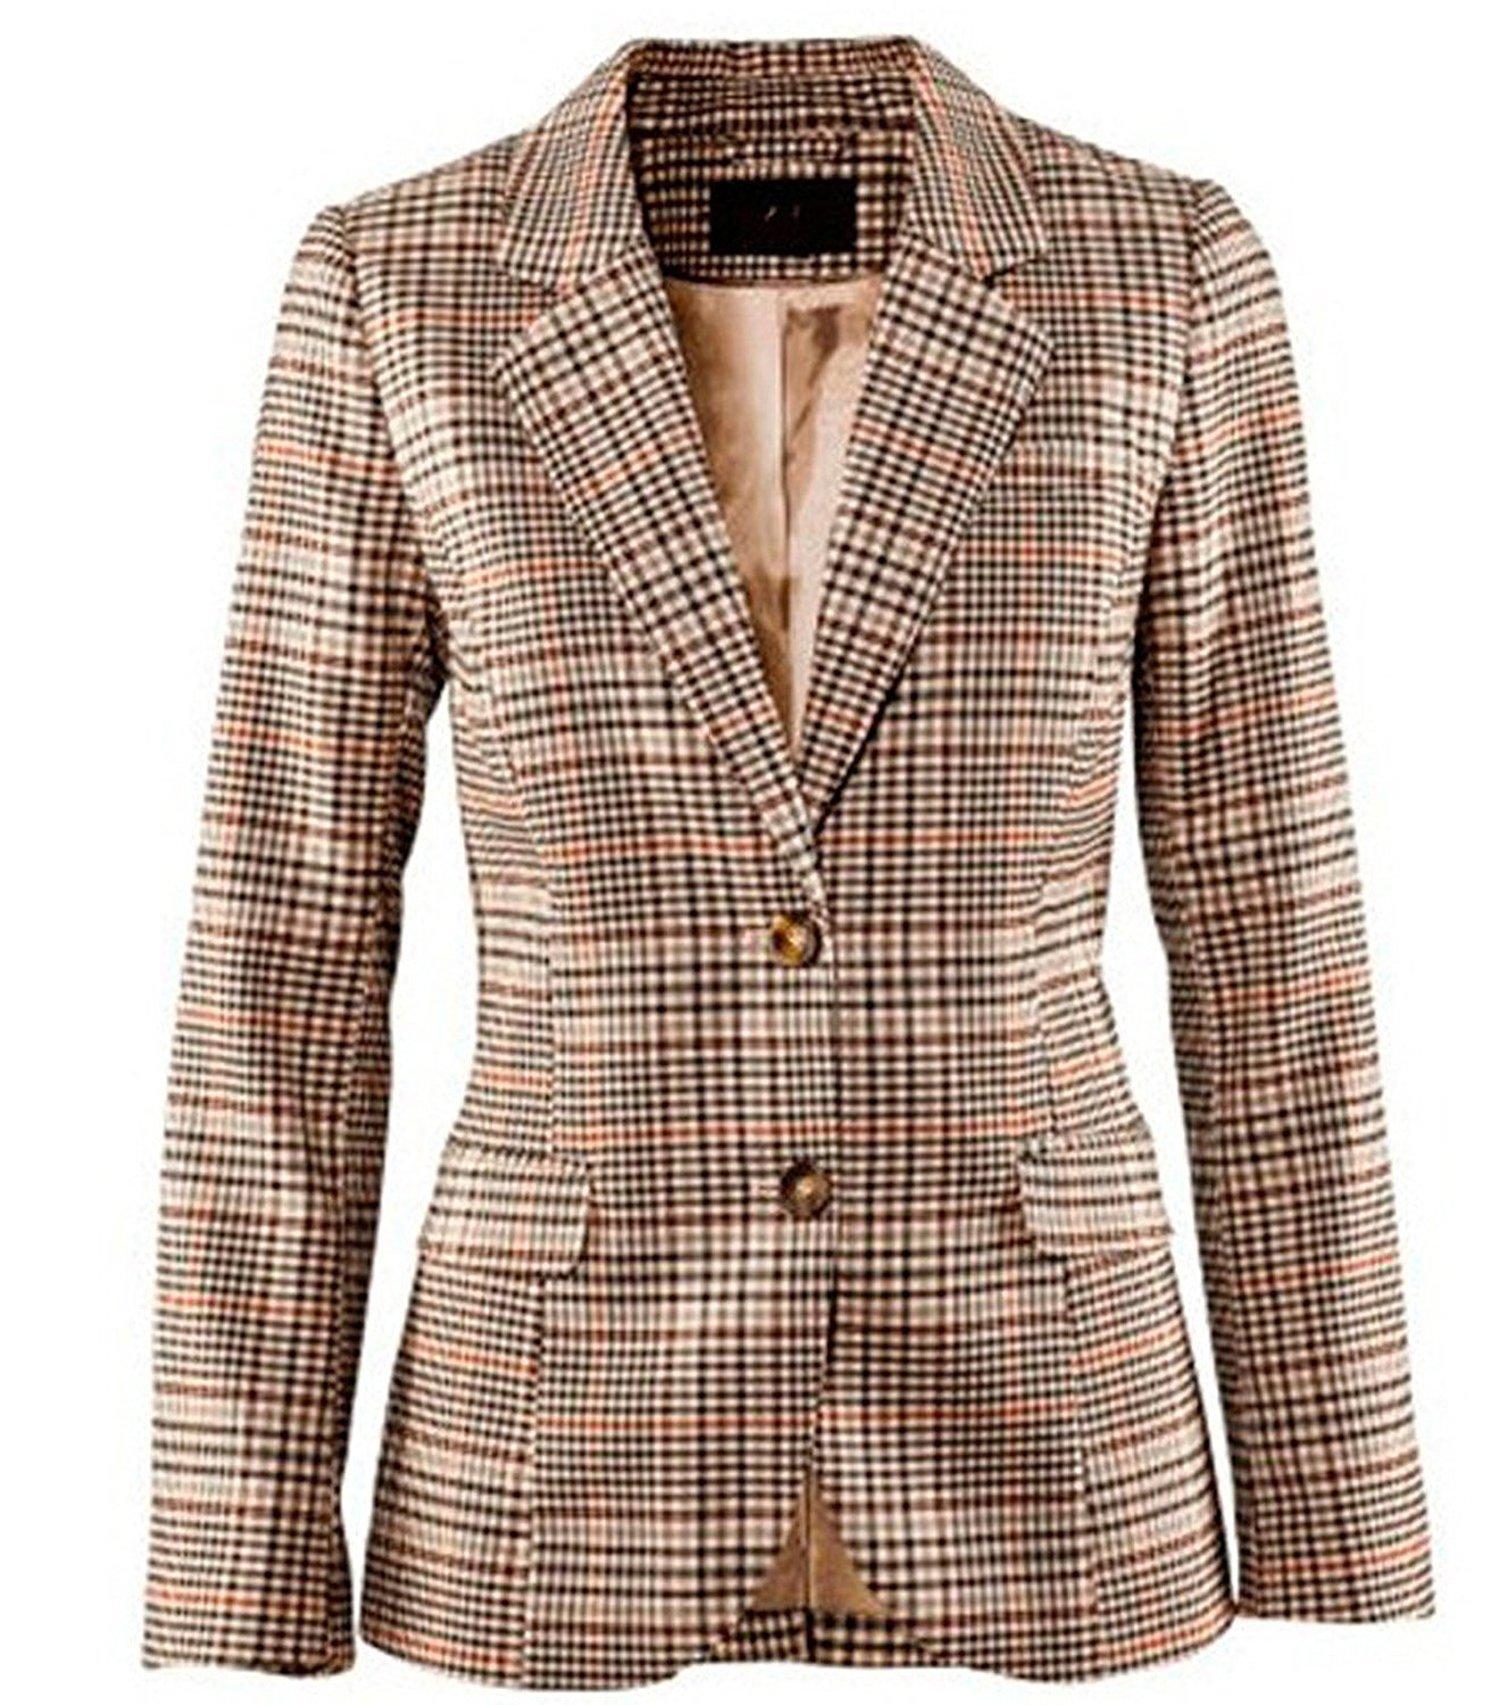 Lokouo Blazer Coat Jacket Women's Juniors Slim Candy Office Blazer Slim Classic Plaid Patch Elbow Suit,Small,PhotoColor